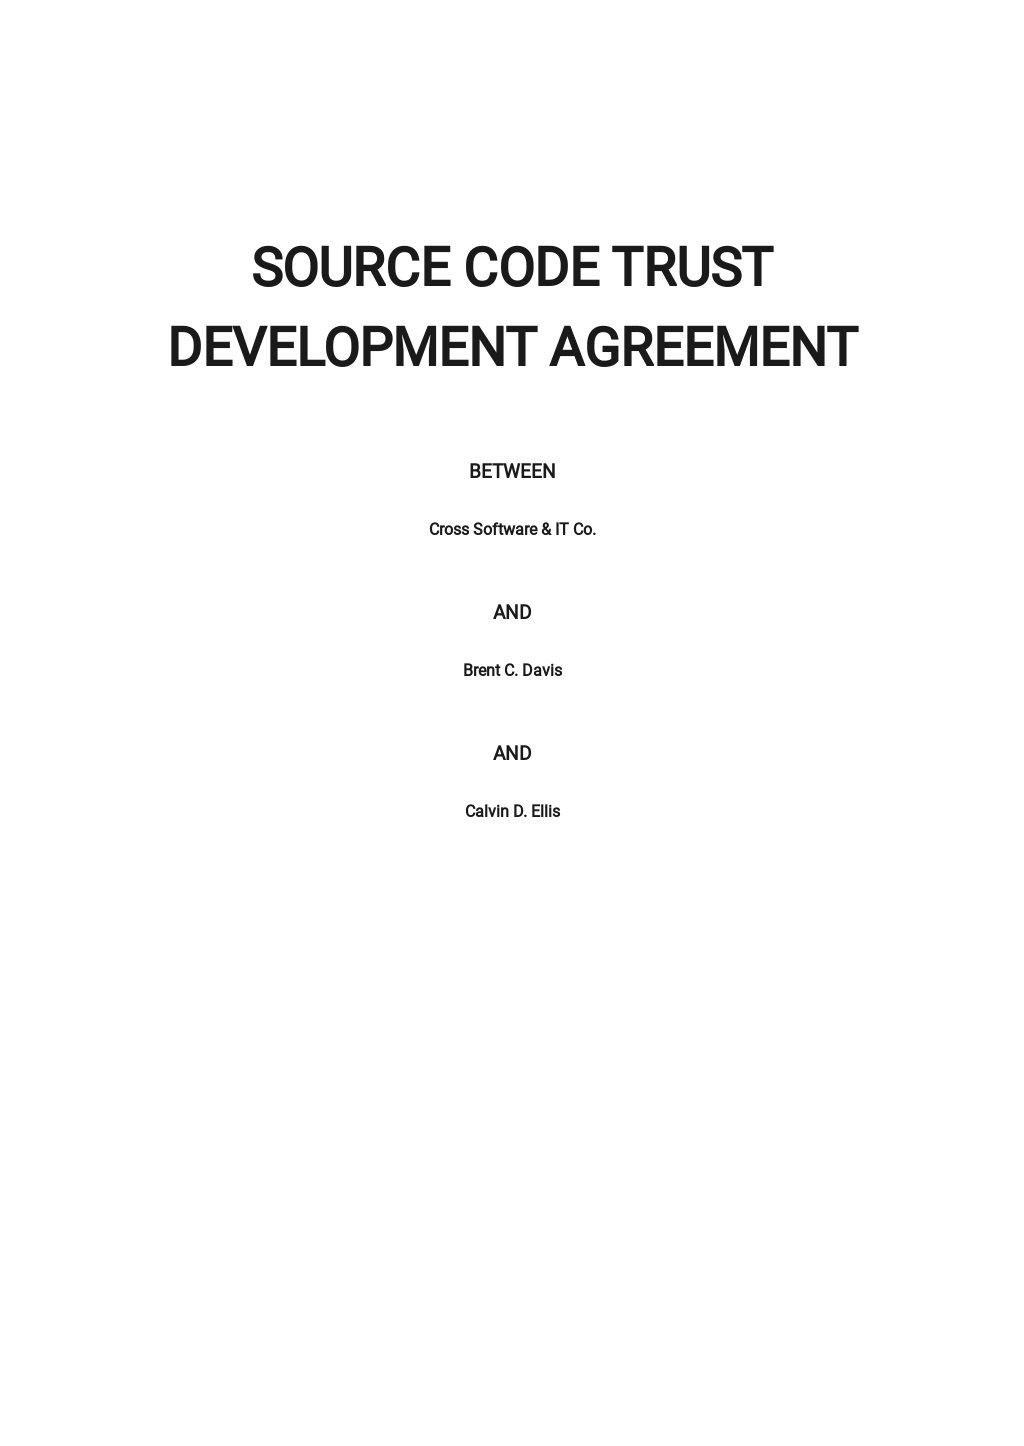 Source Code Trust Agreement Development Template.jpe